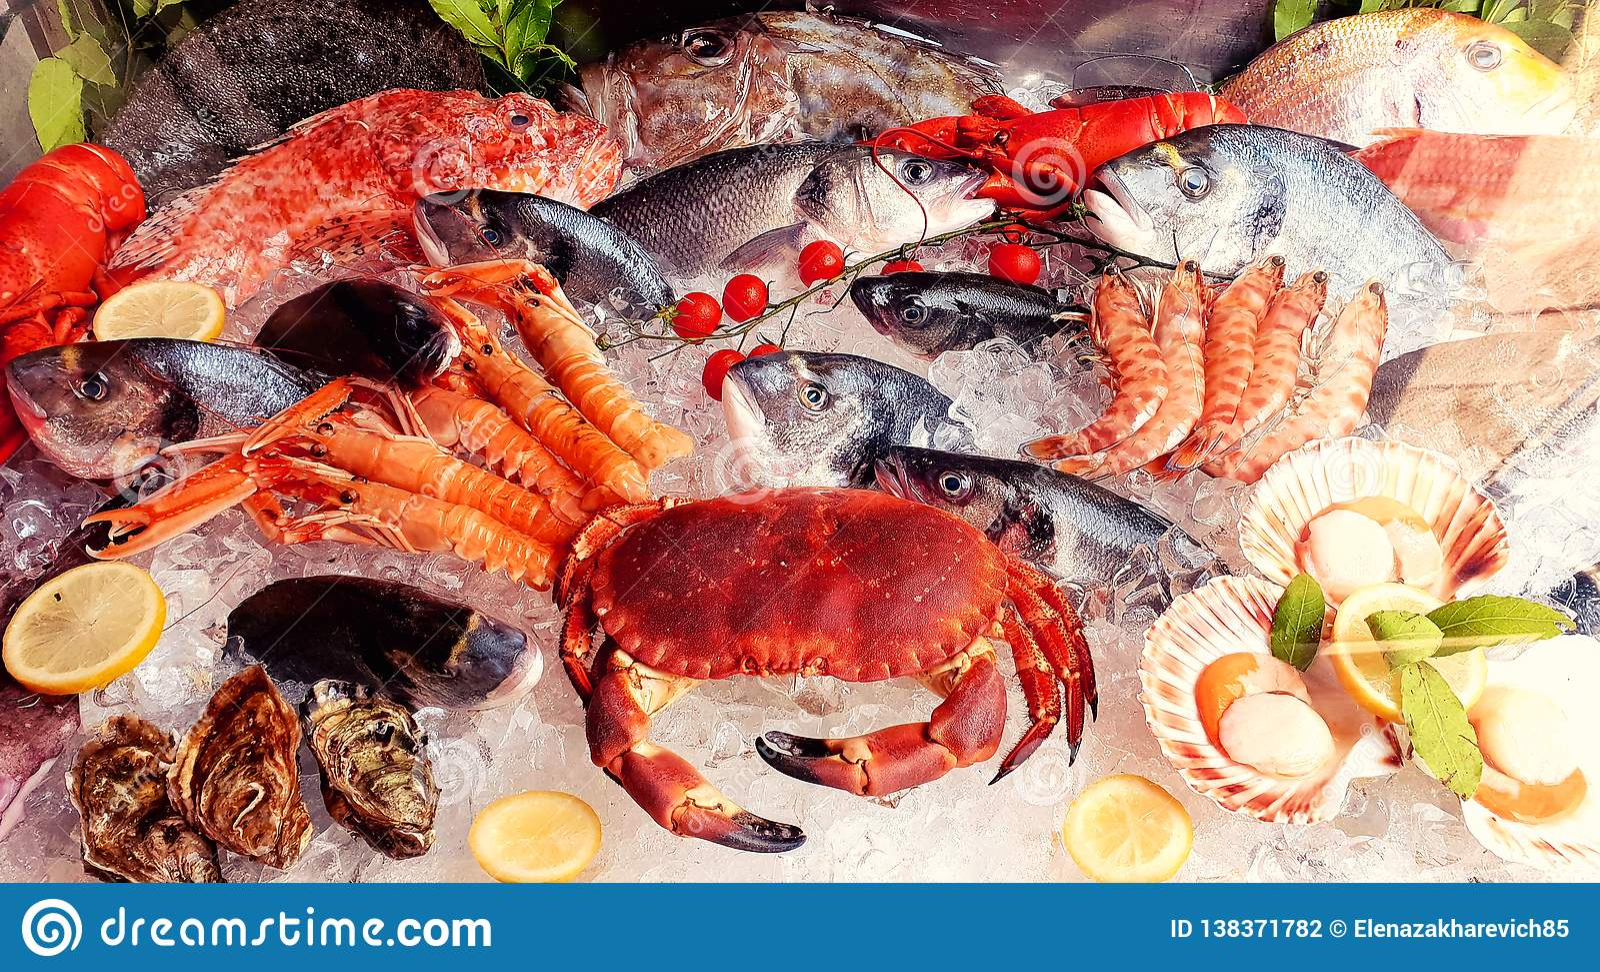 Variété de fruits de mer